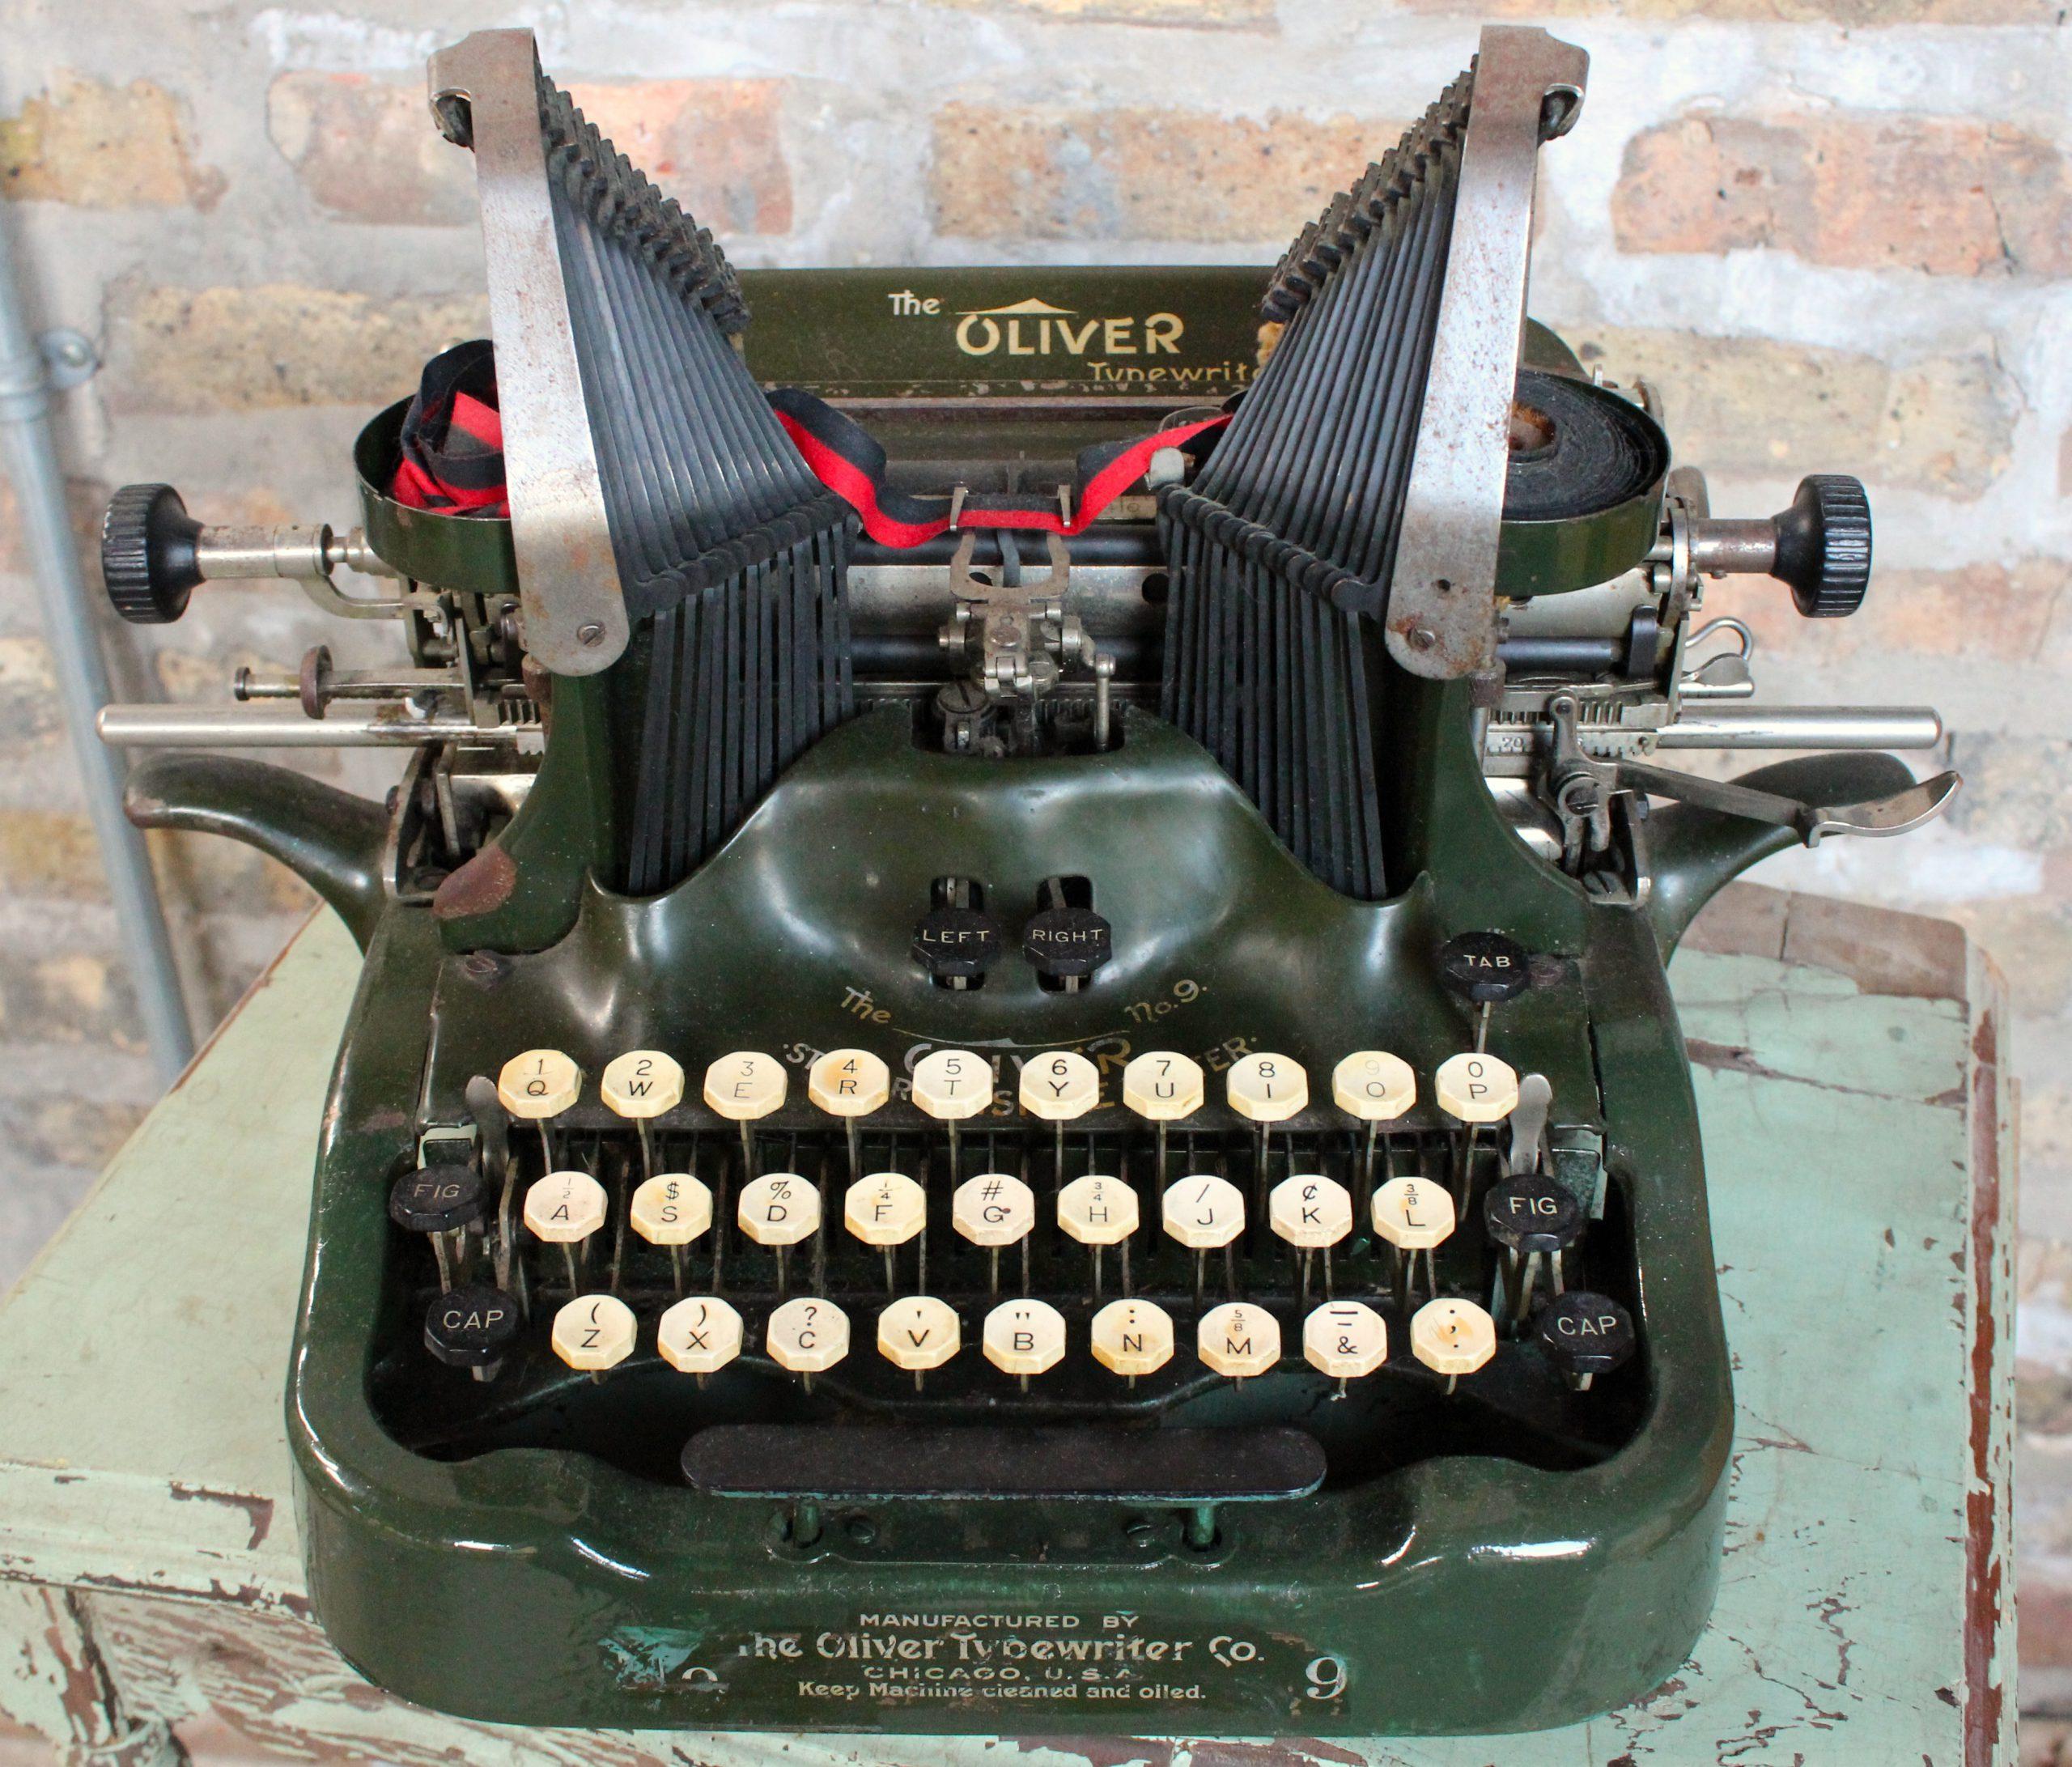 Oliver Typewriter Company, est. 1896